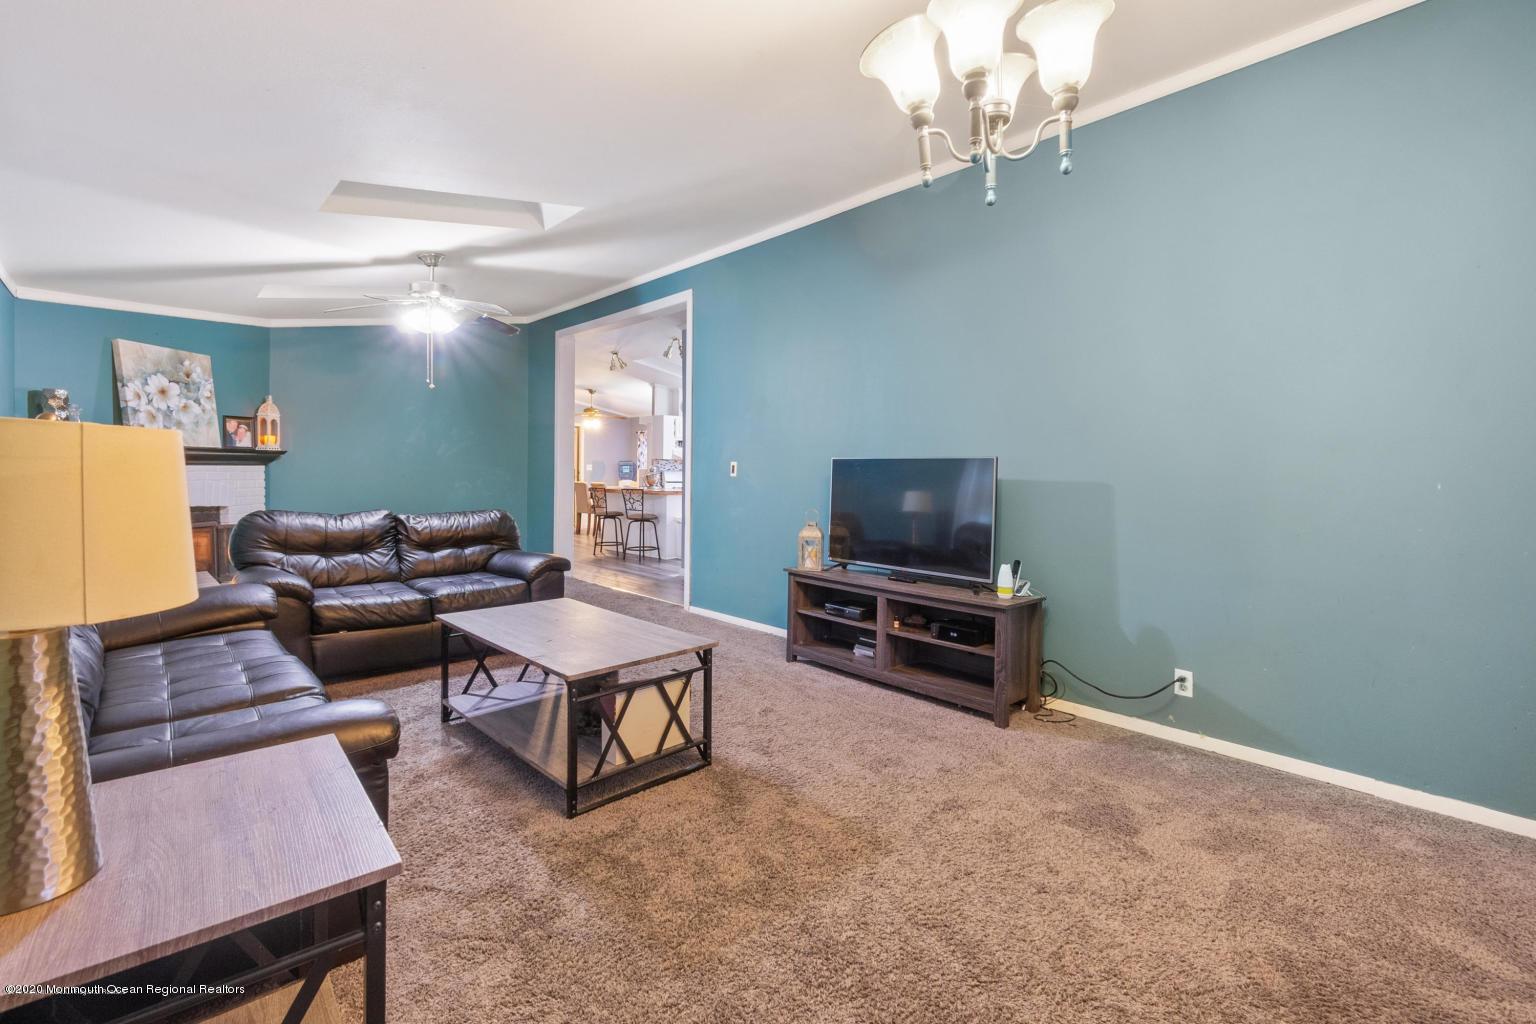 10 snow chief living room area 1